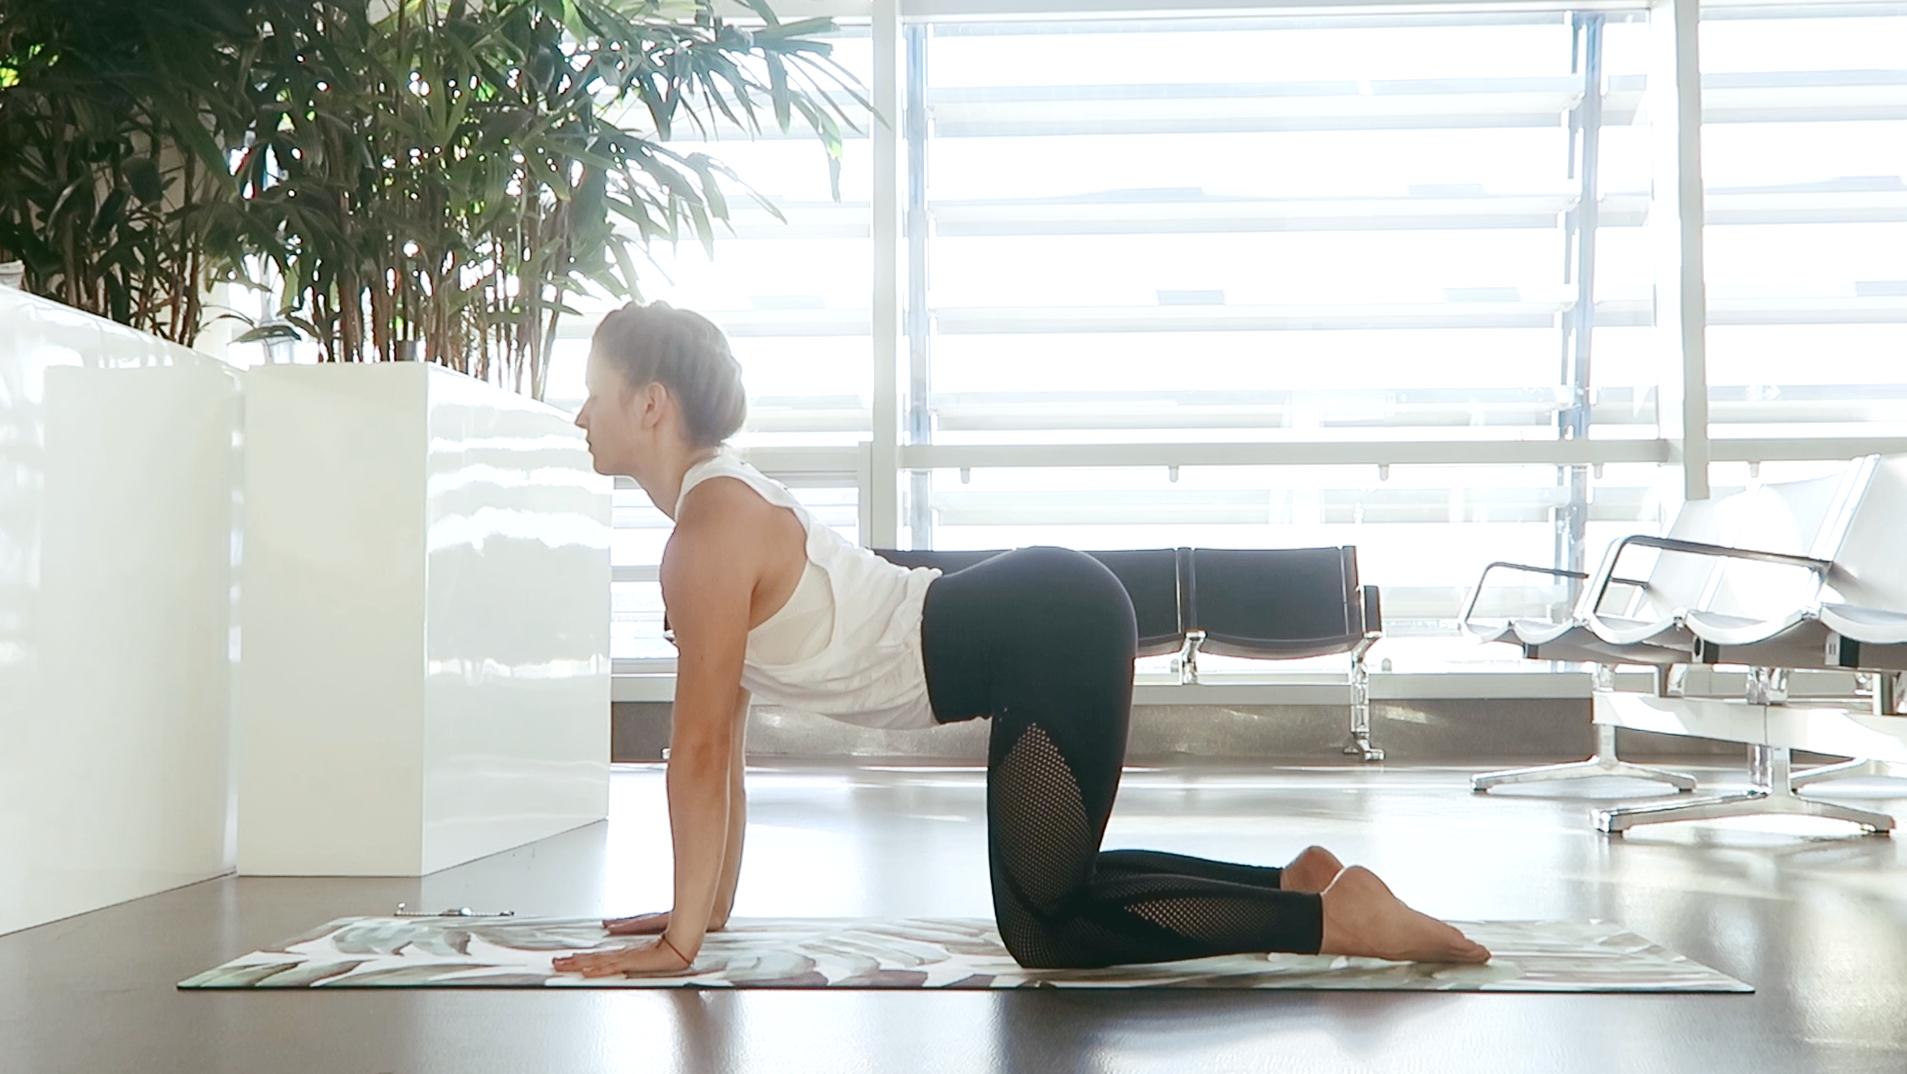 Mady-Morrison-Yoga-Vinyasa-Flow-After-Work-00005